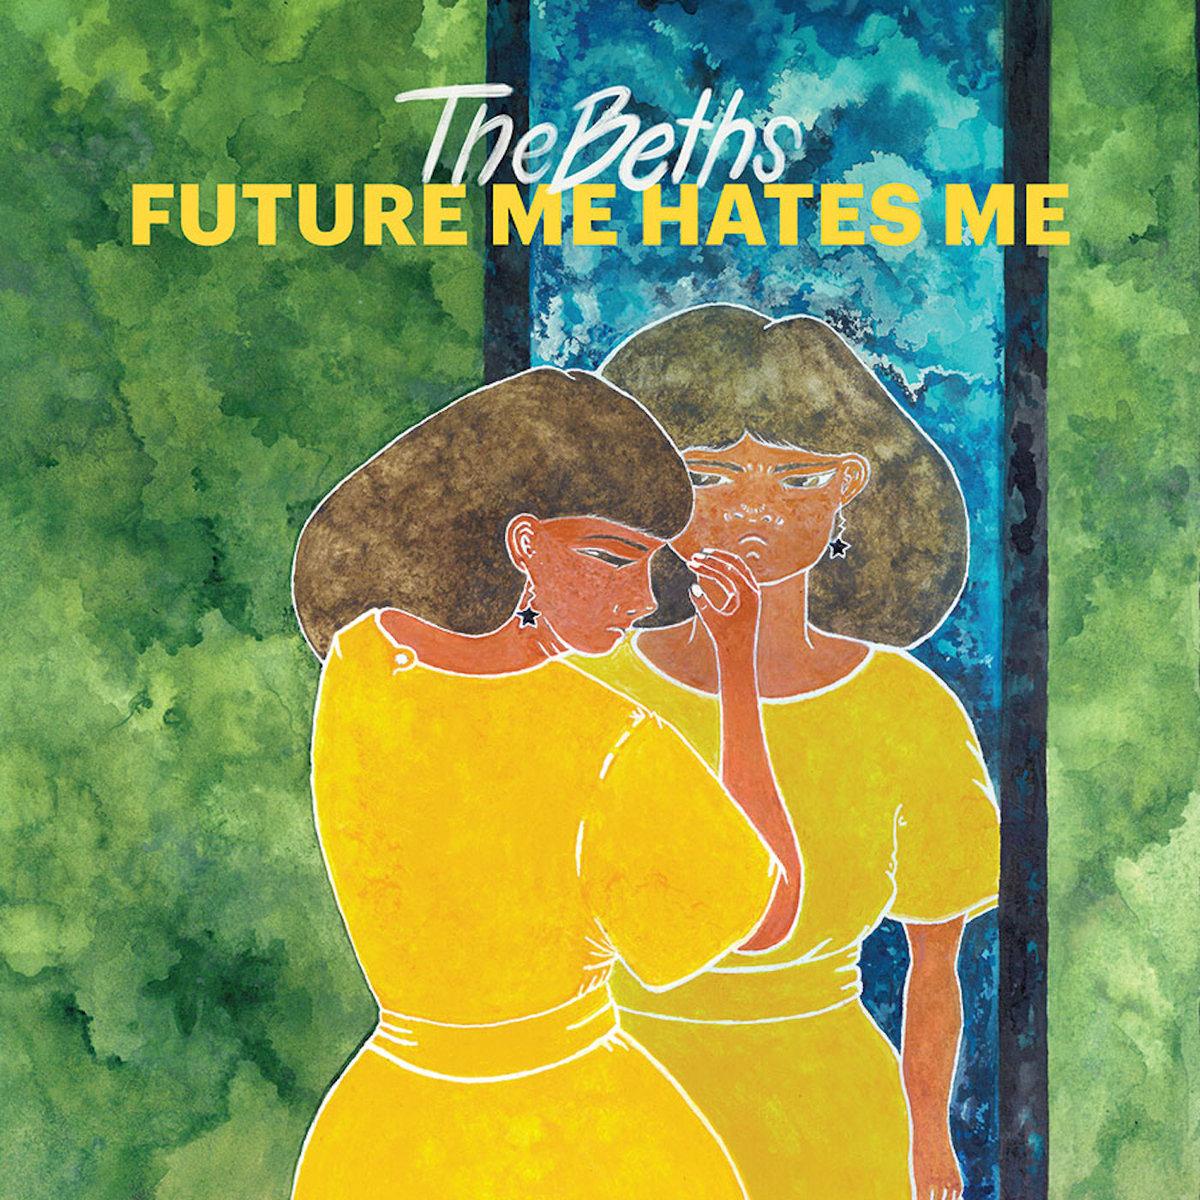 24. The Beths - Future Me Hates Me